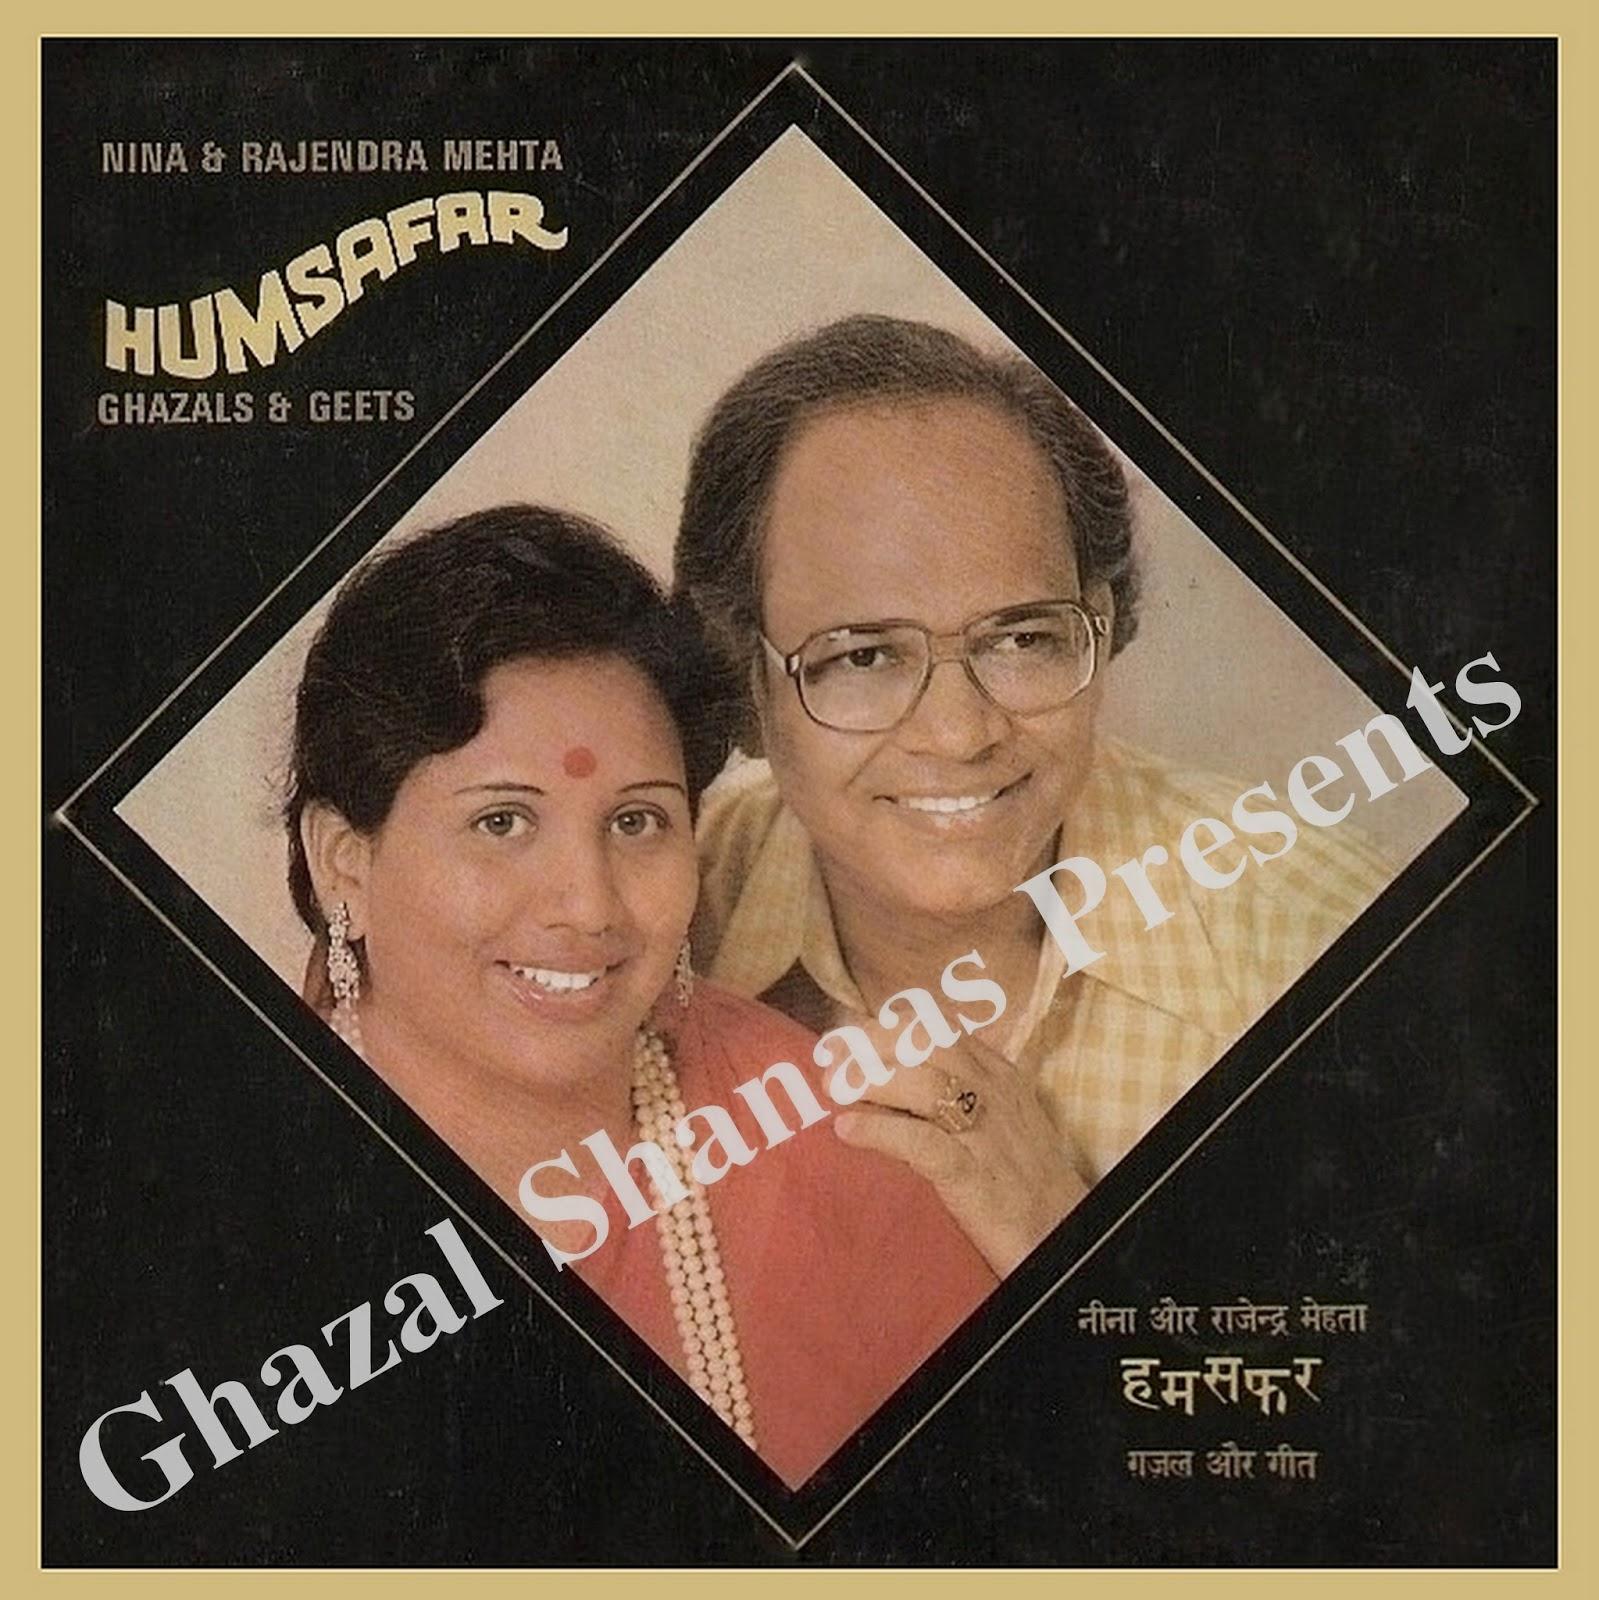 Nano Ki Do Baat Song Free Download: Ghazal Shanaas: HumSafar (1980) Album By Nina & Rajendra Mehta